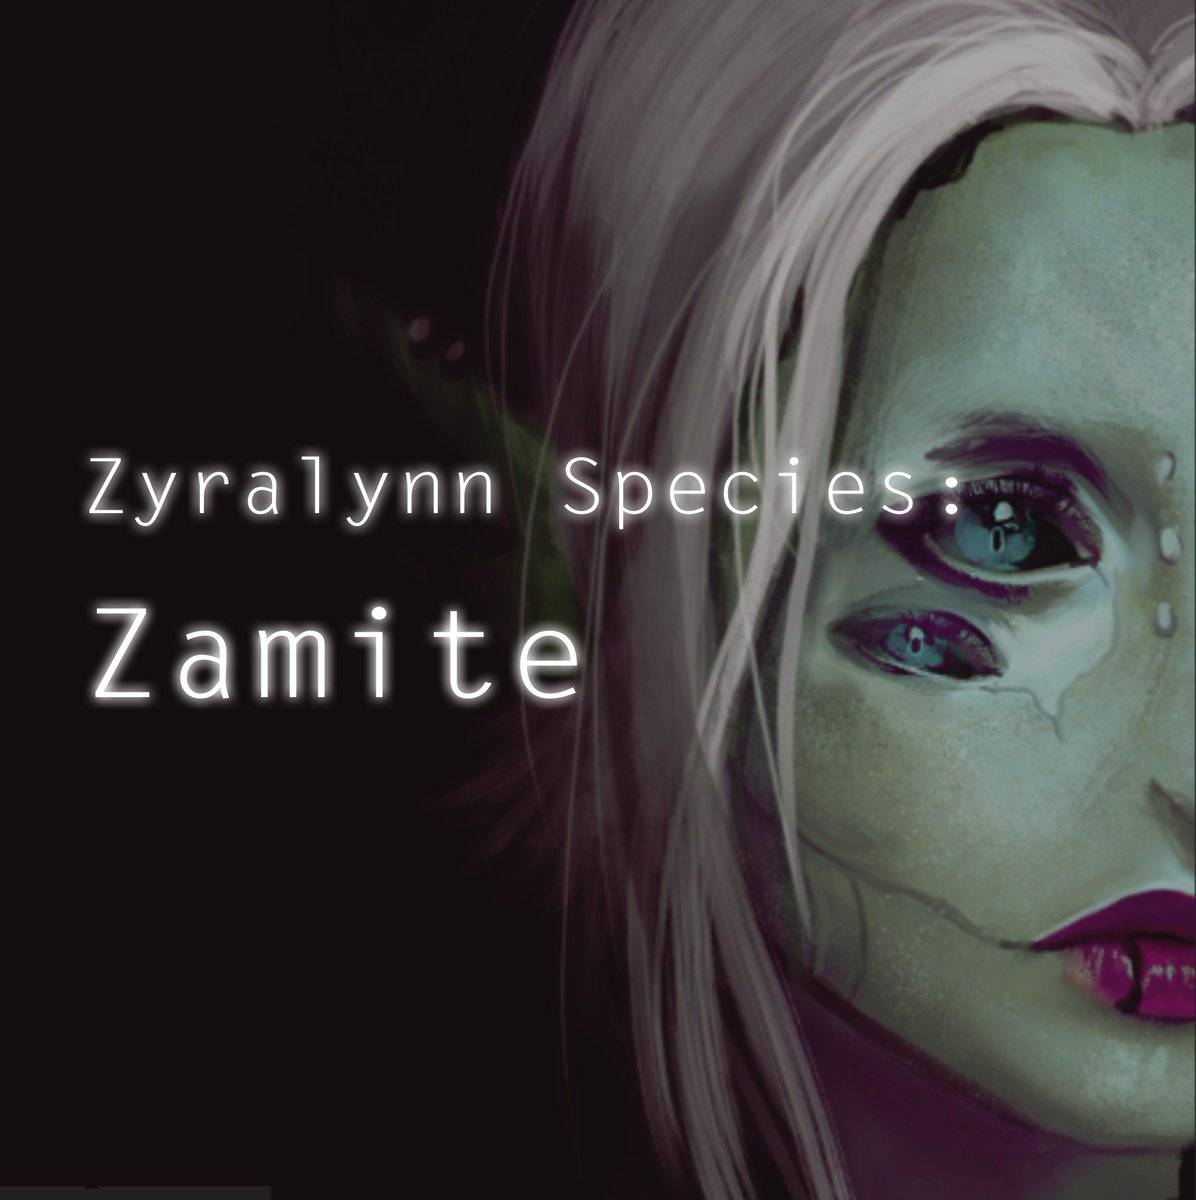 Zyralynn will be @JWMadrid on Twitter: